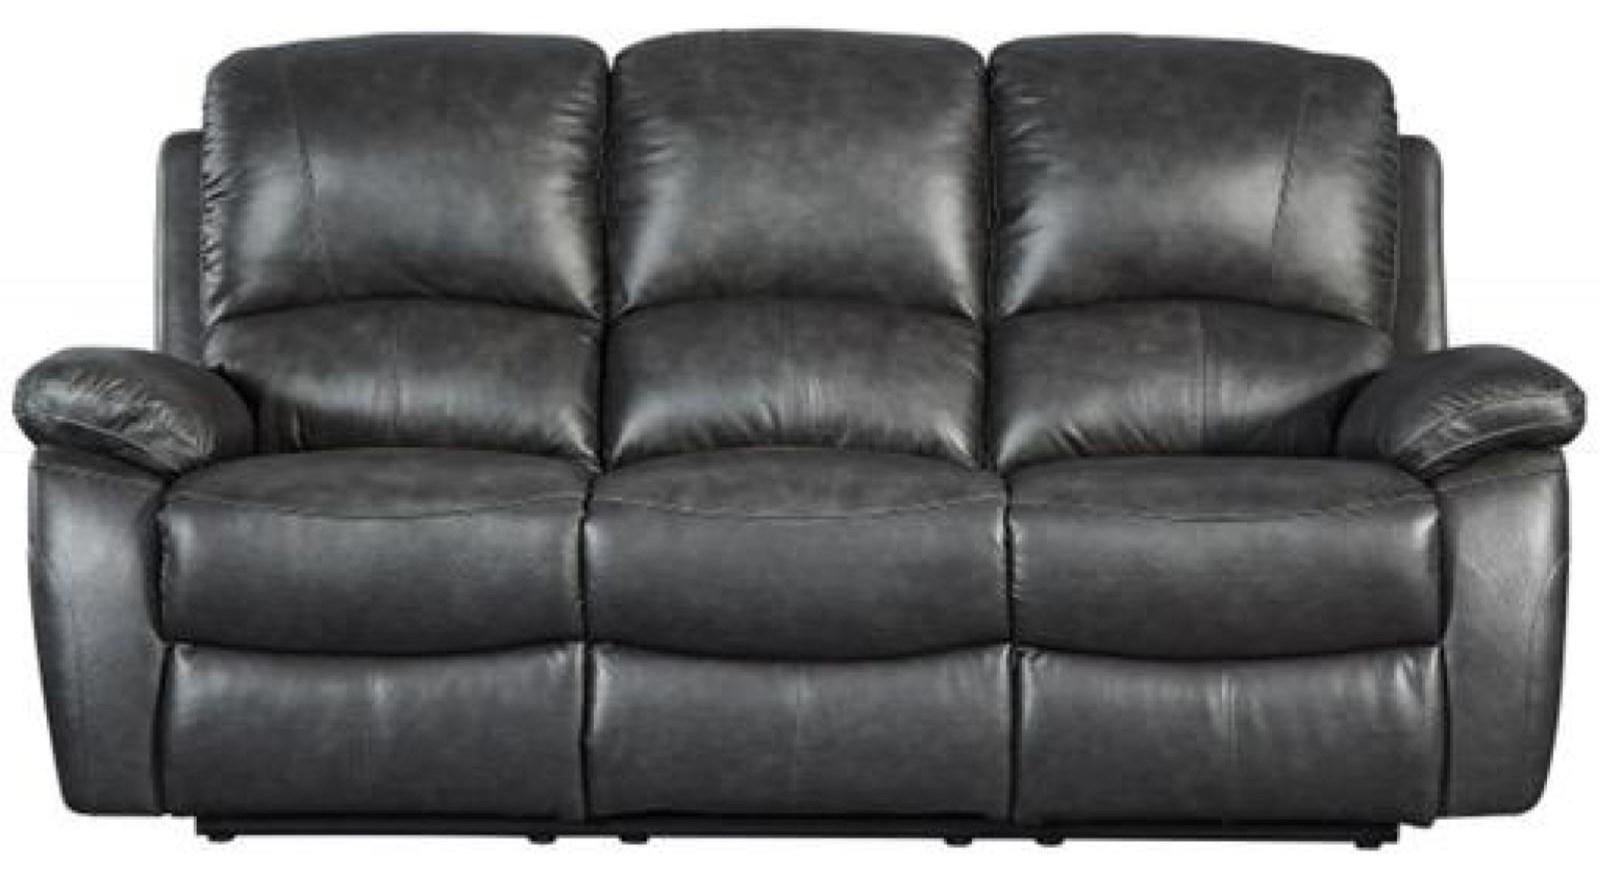 leather italia sofa furniture rattan garden corner jasmine bennett s home furnishings reclining sofas